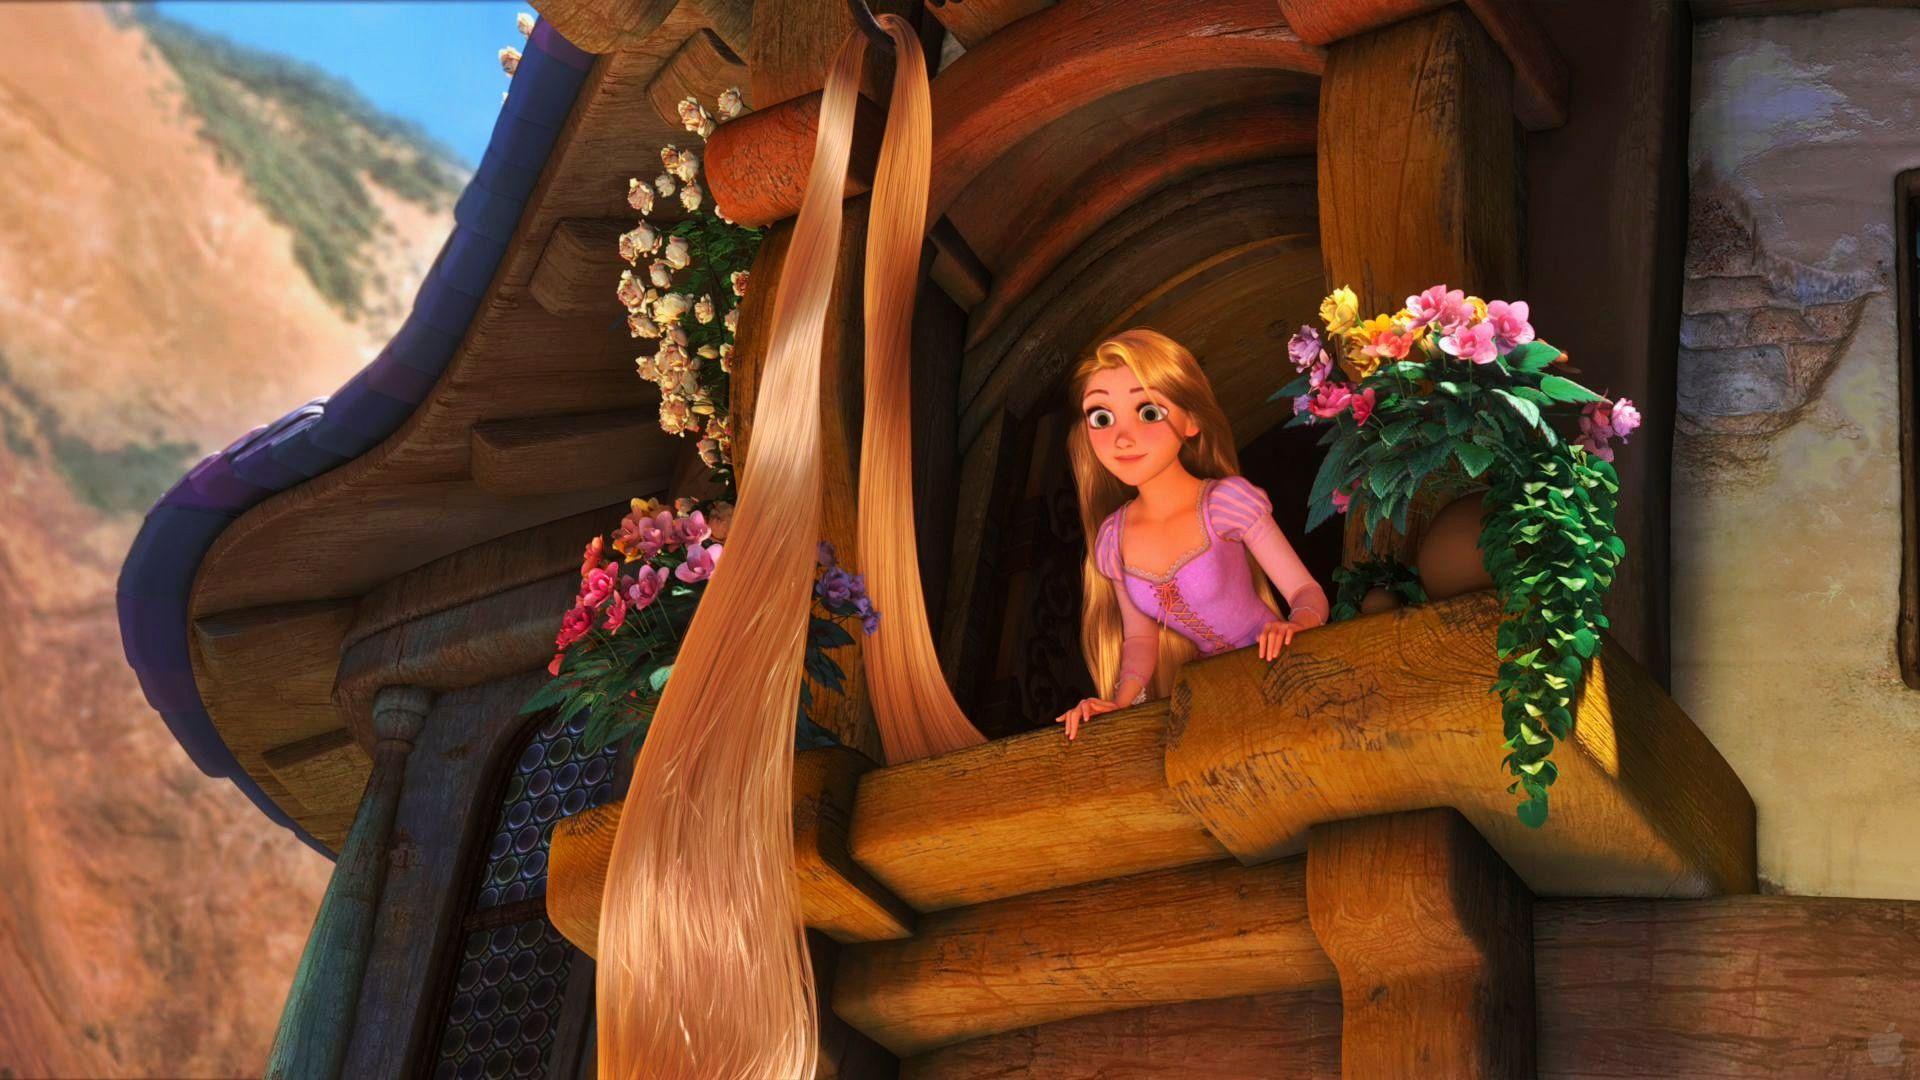 Tangled Baby Rapunzel HD desktop wallpaper : Widescreen ...